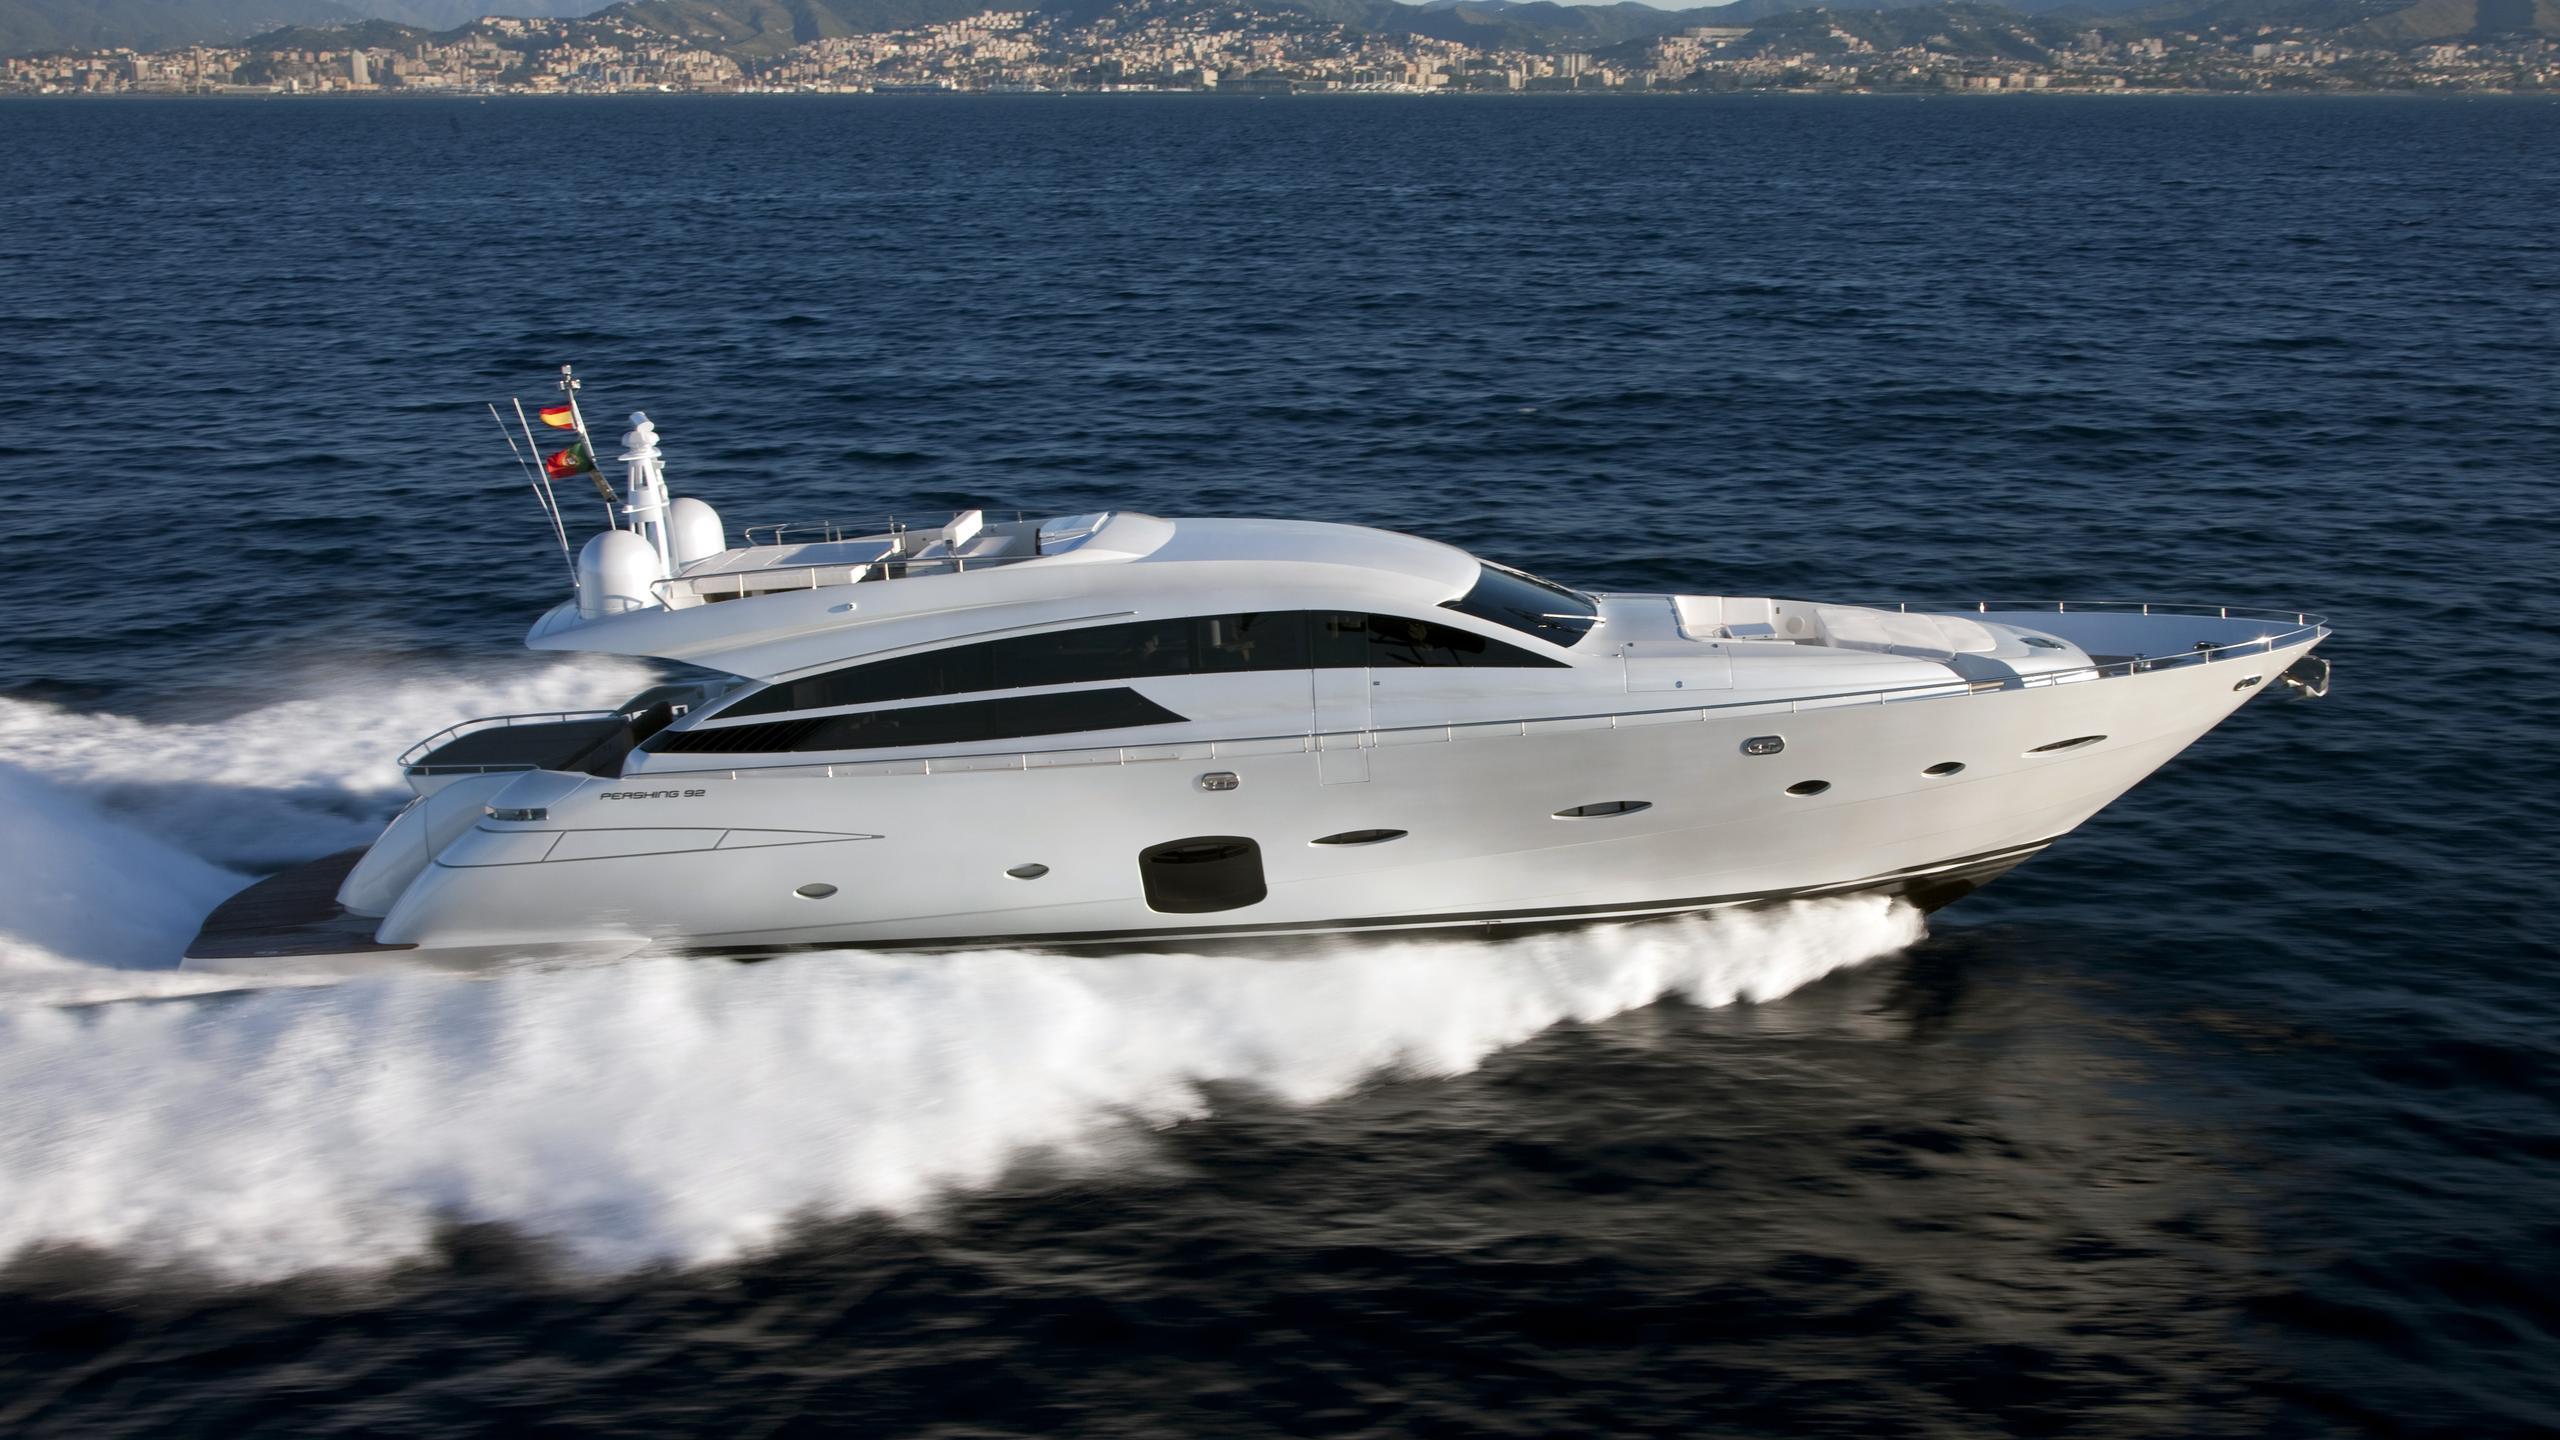 incognito-pershing-92-motor-yacht-2011-28m-cruising